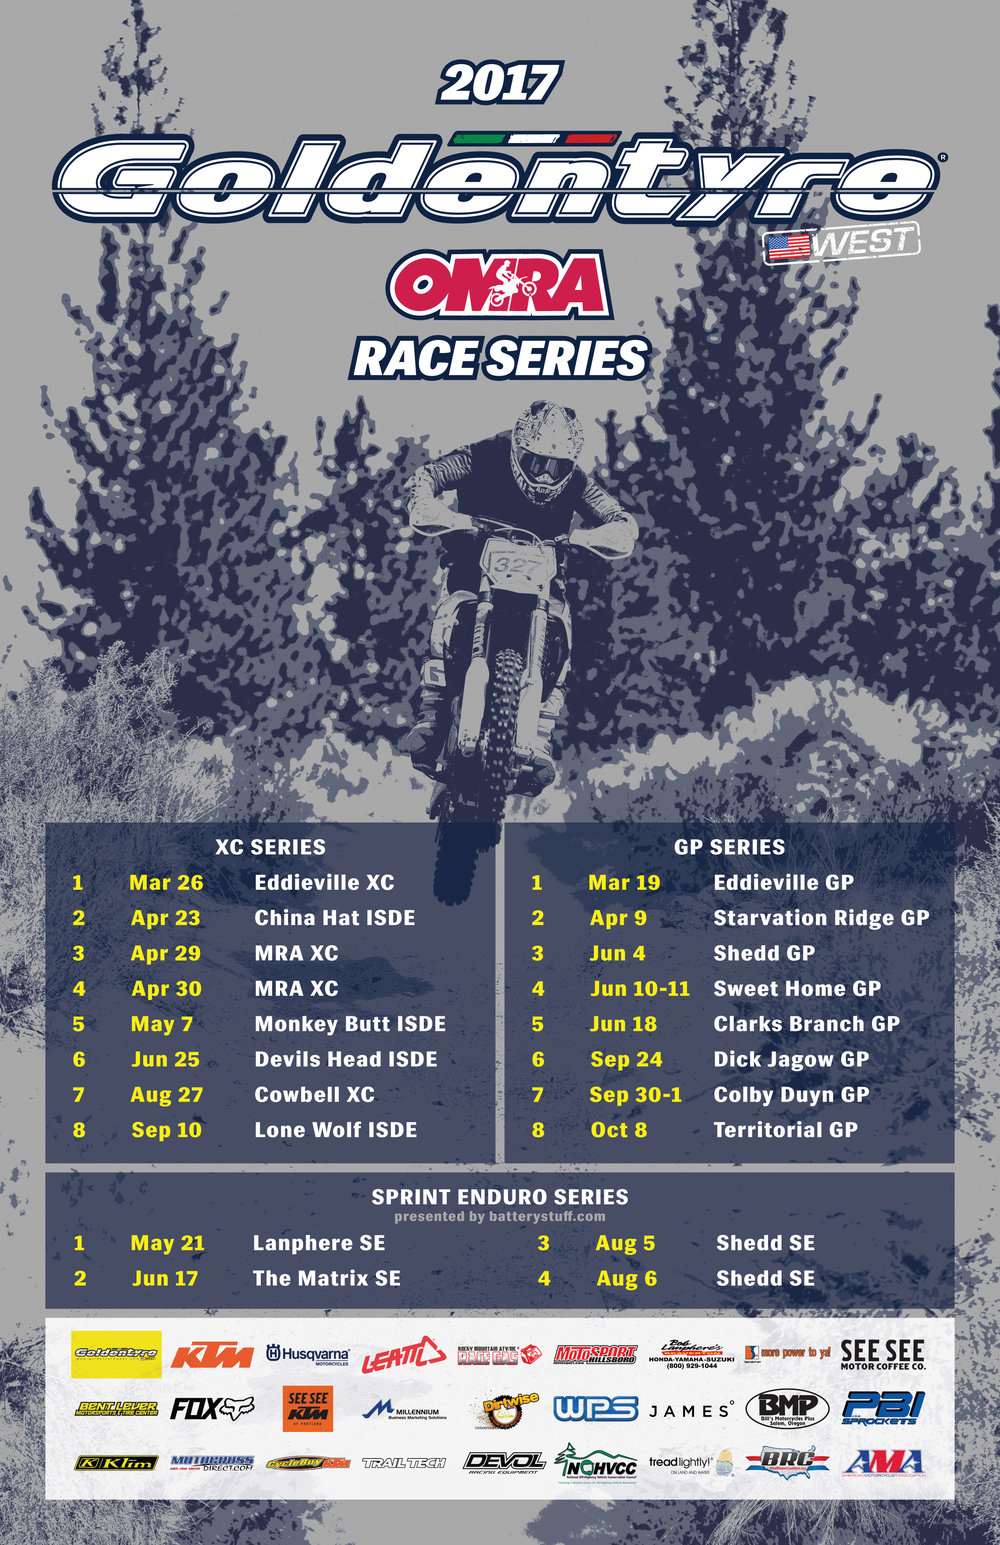 2017_GTW_OMRA_Race_Series_Poster.jpg